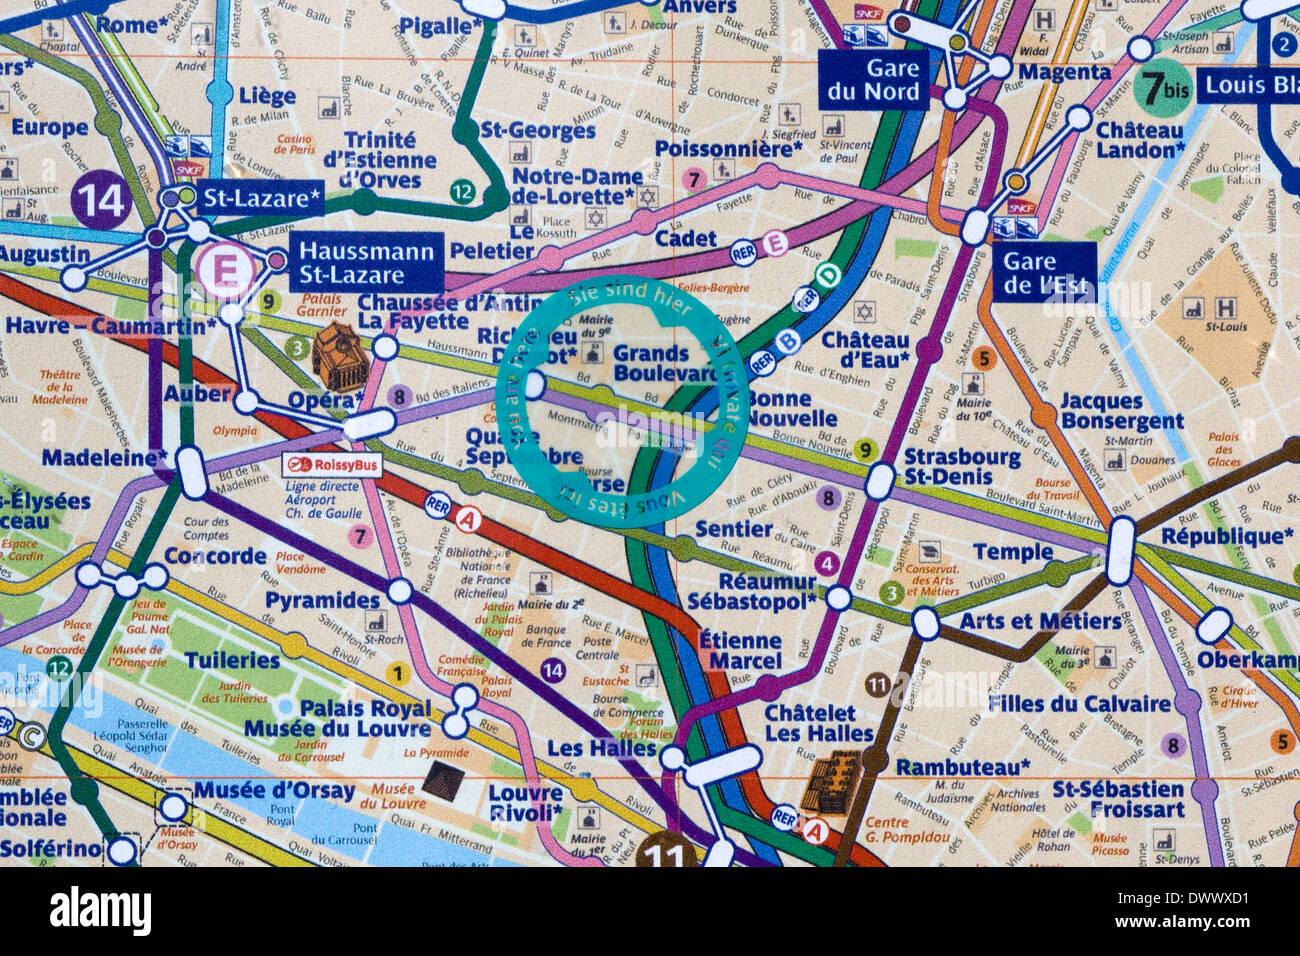 Parigi Cartina Turistica.A Piedi La Mappa Turistica Di Parigi Francia Siete Qui Foto Stock Alamy